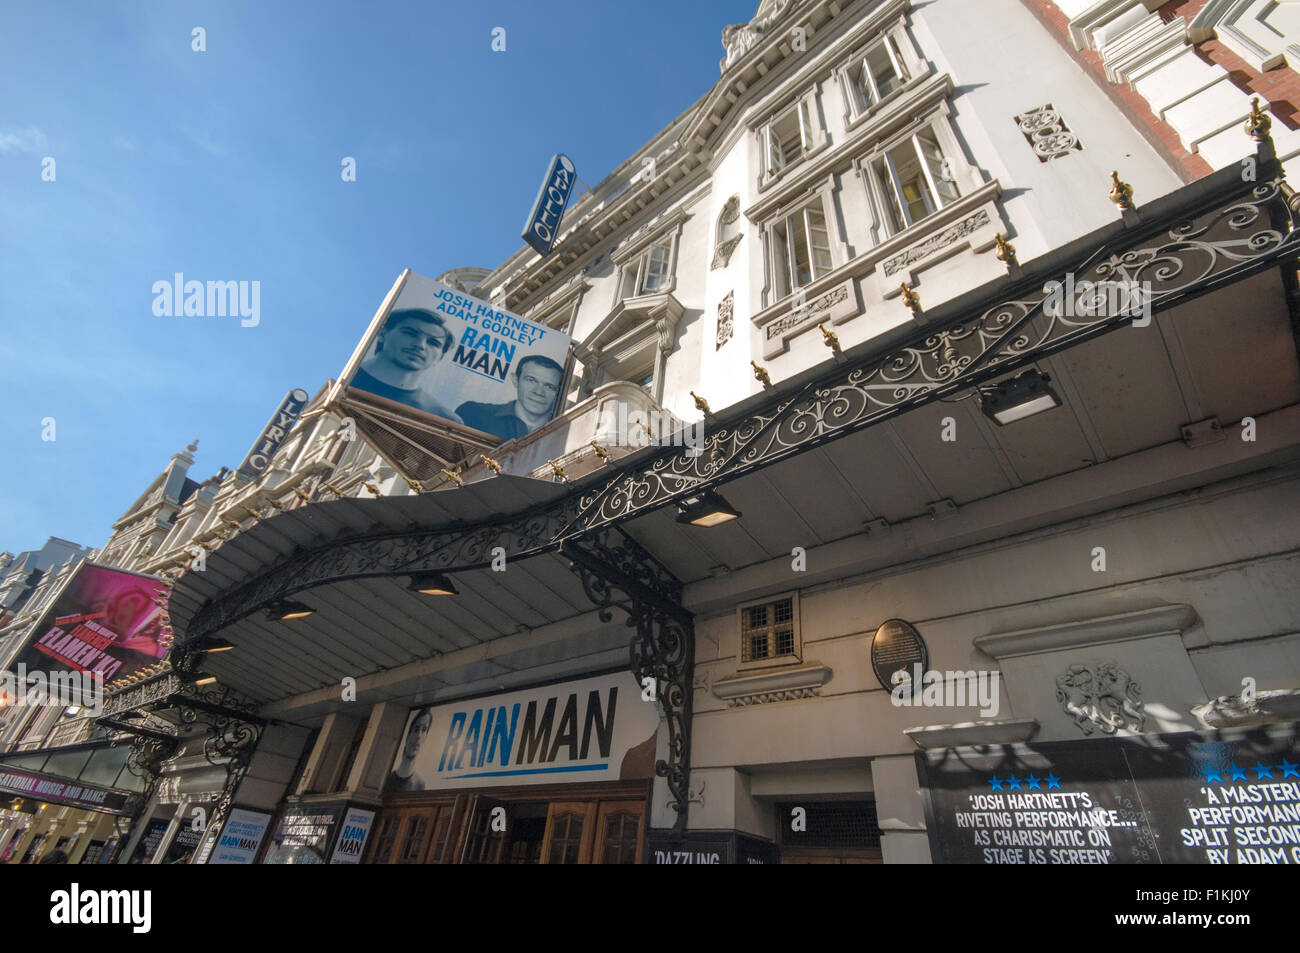 Apollo Theatre, Shaftesbury Avenue, London - Stock Image